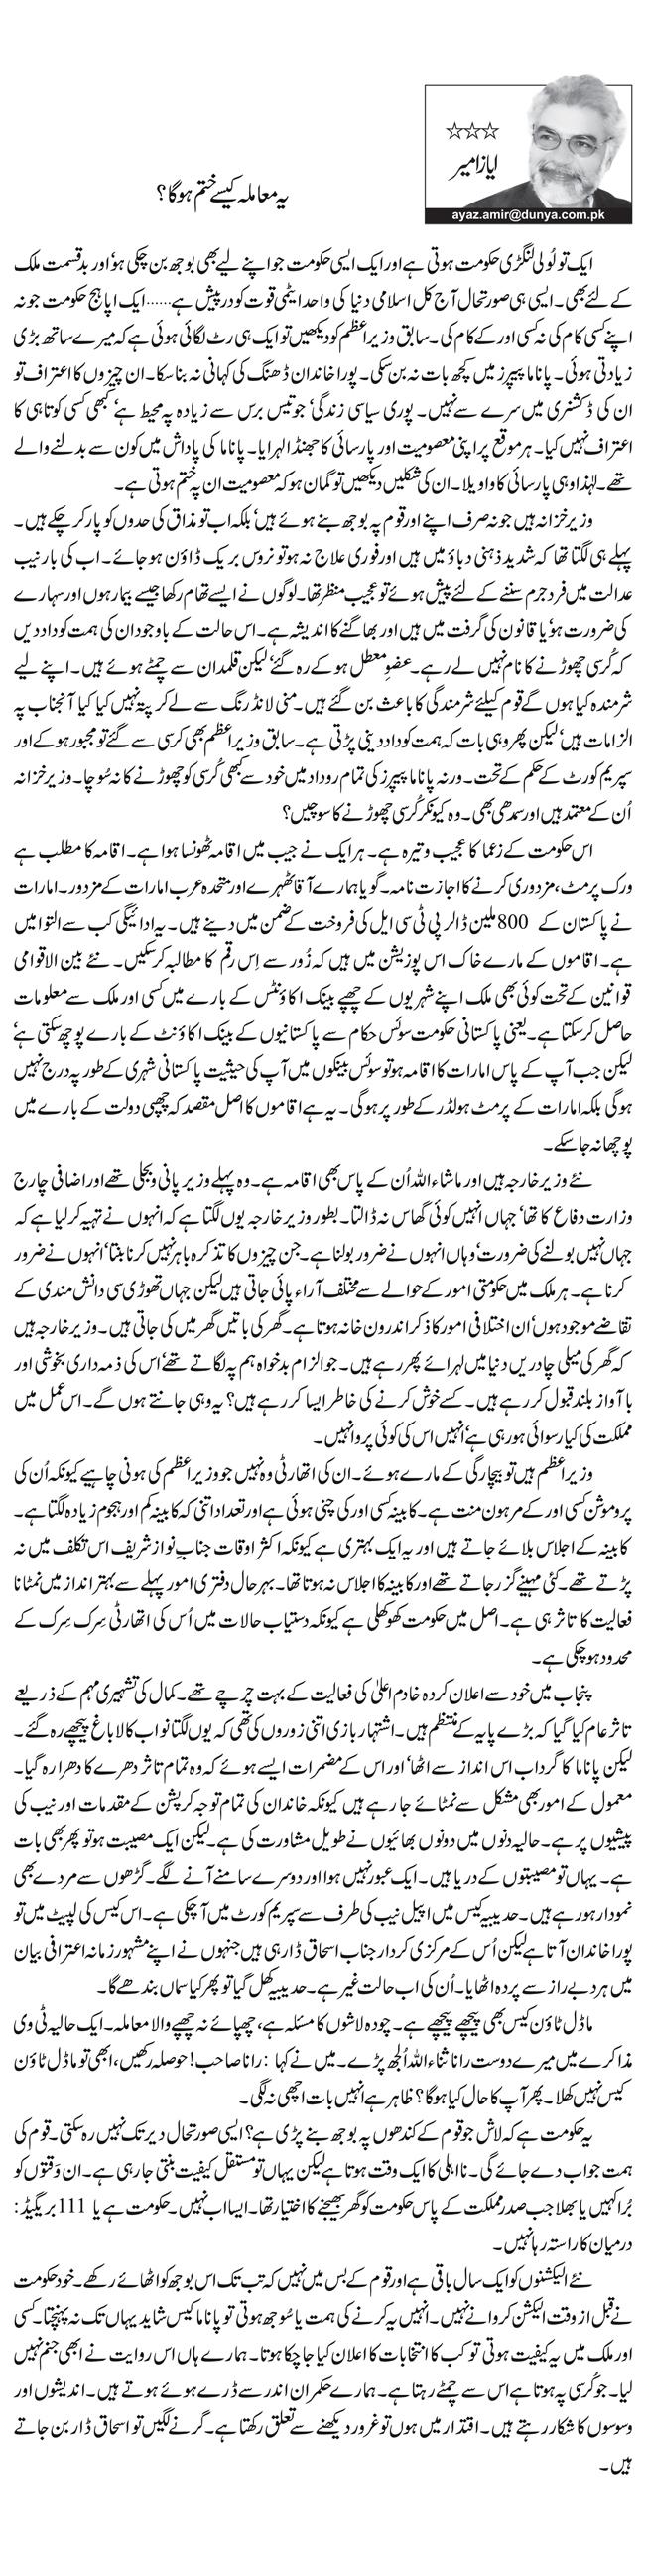 Ye Mamla Kese Khatam Hoga?   Ayaz Amir   Daily Urdu Columns